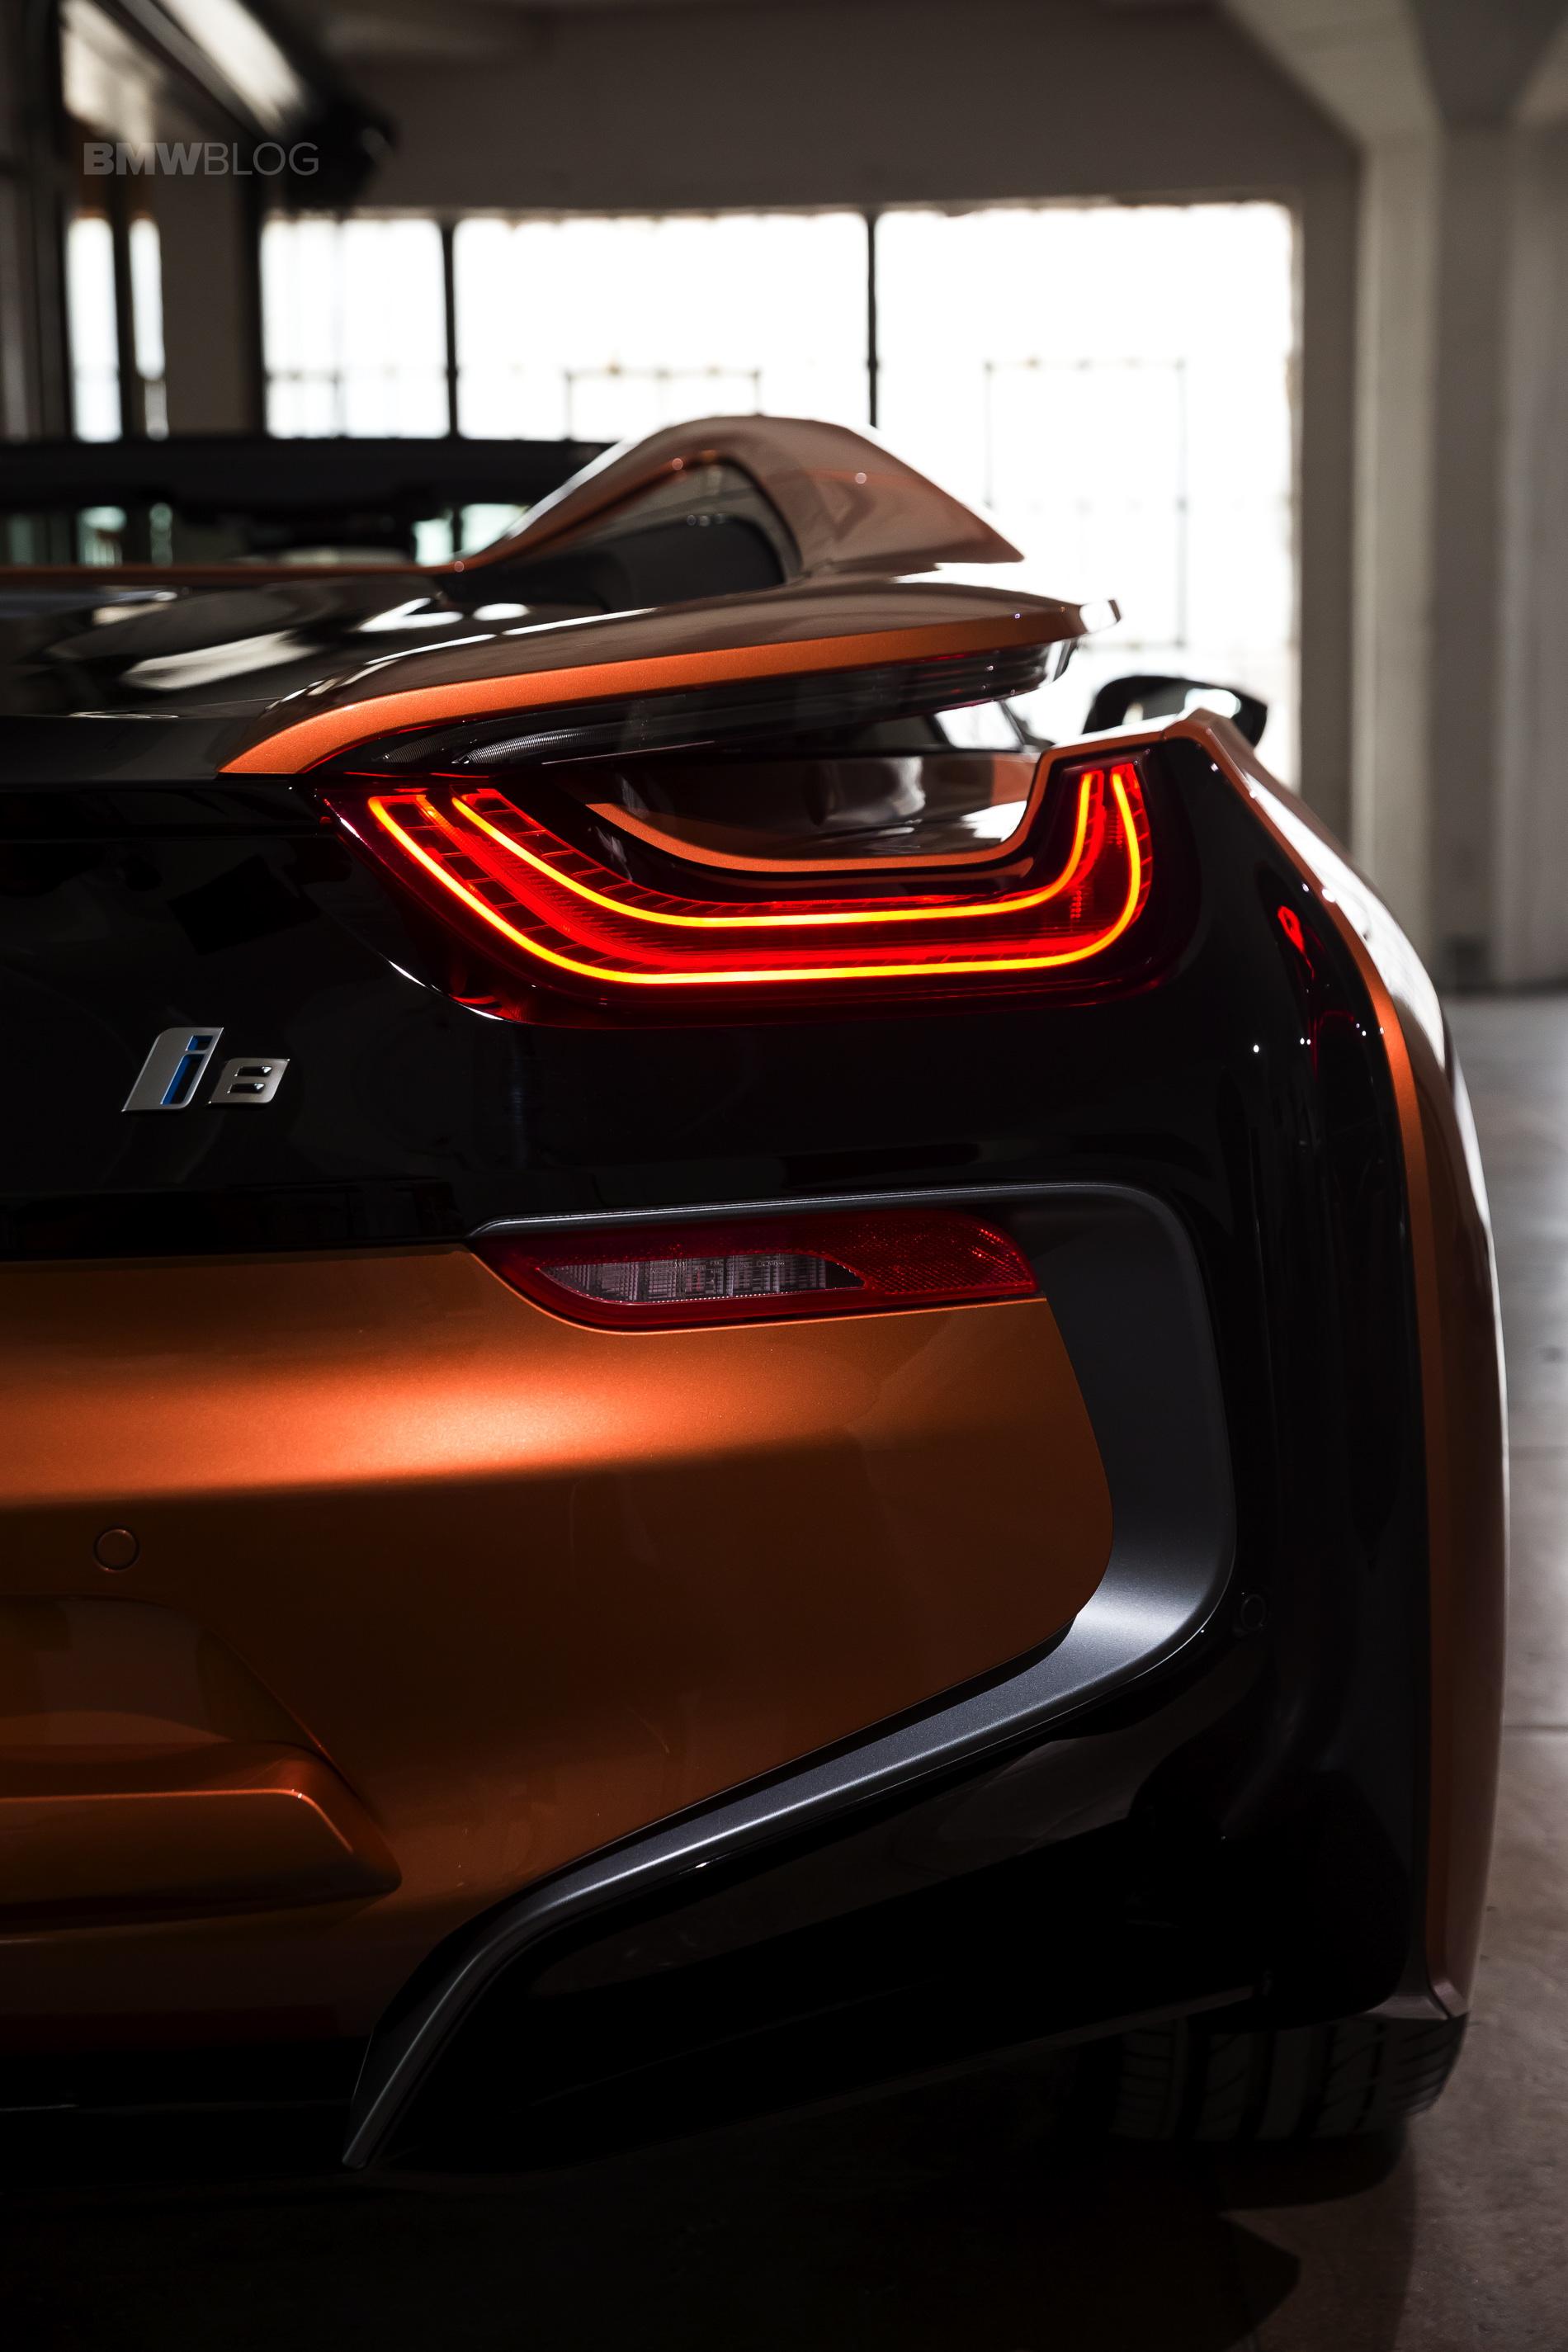 2018-BMW-i8-Roadster-23.jpg